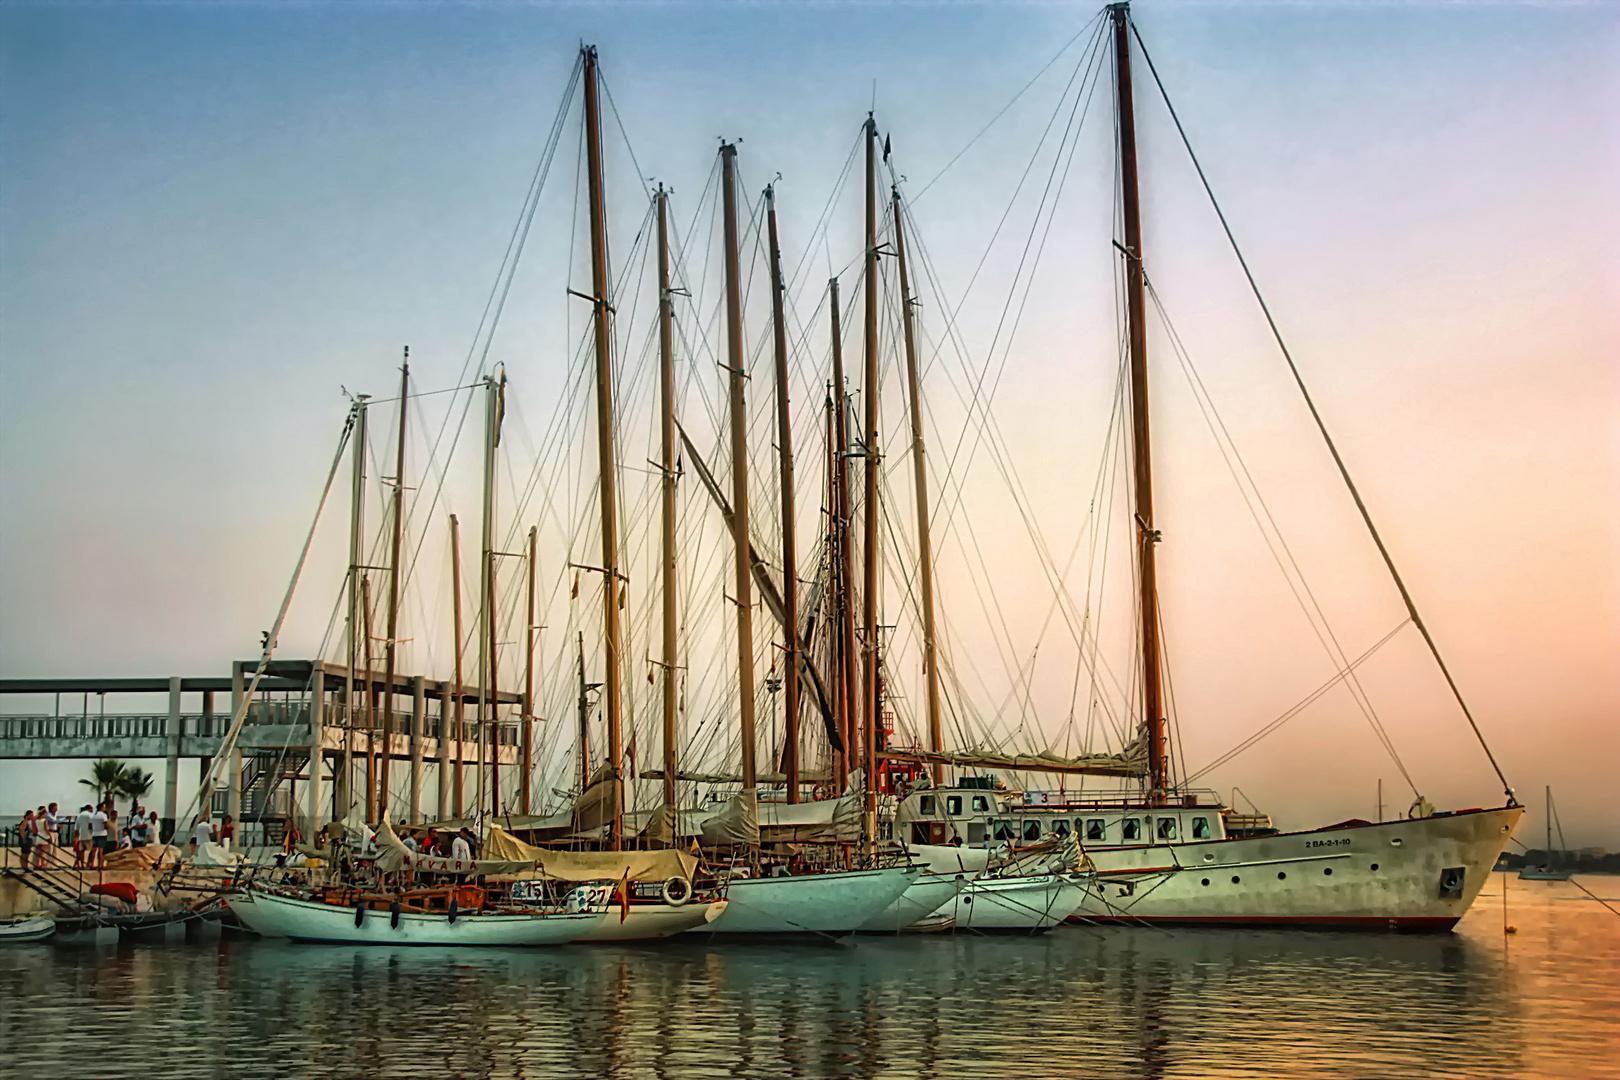 Barcos de época II